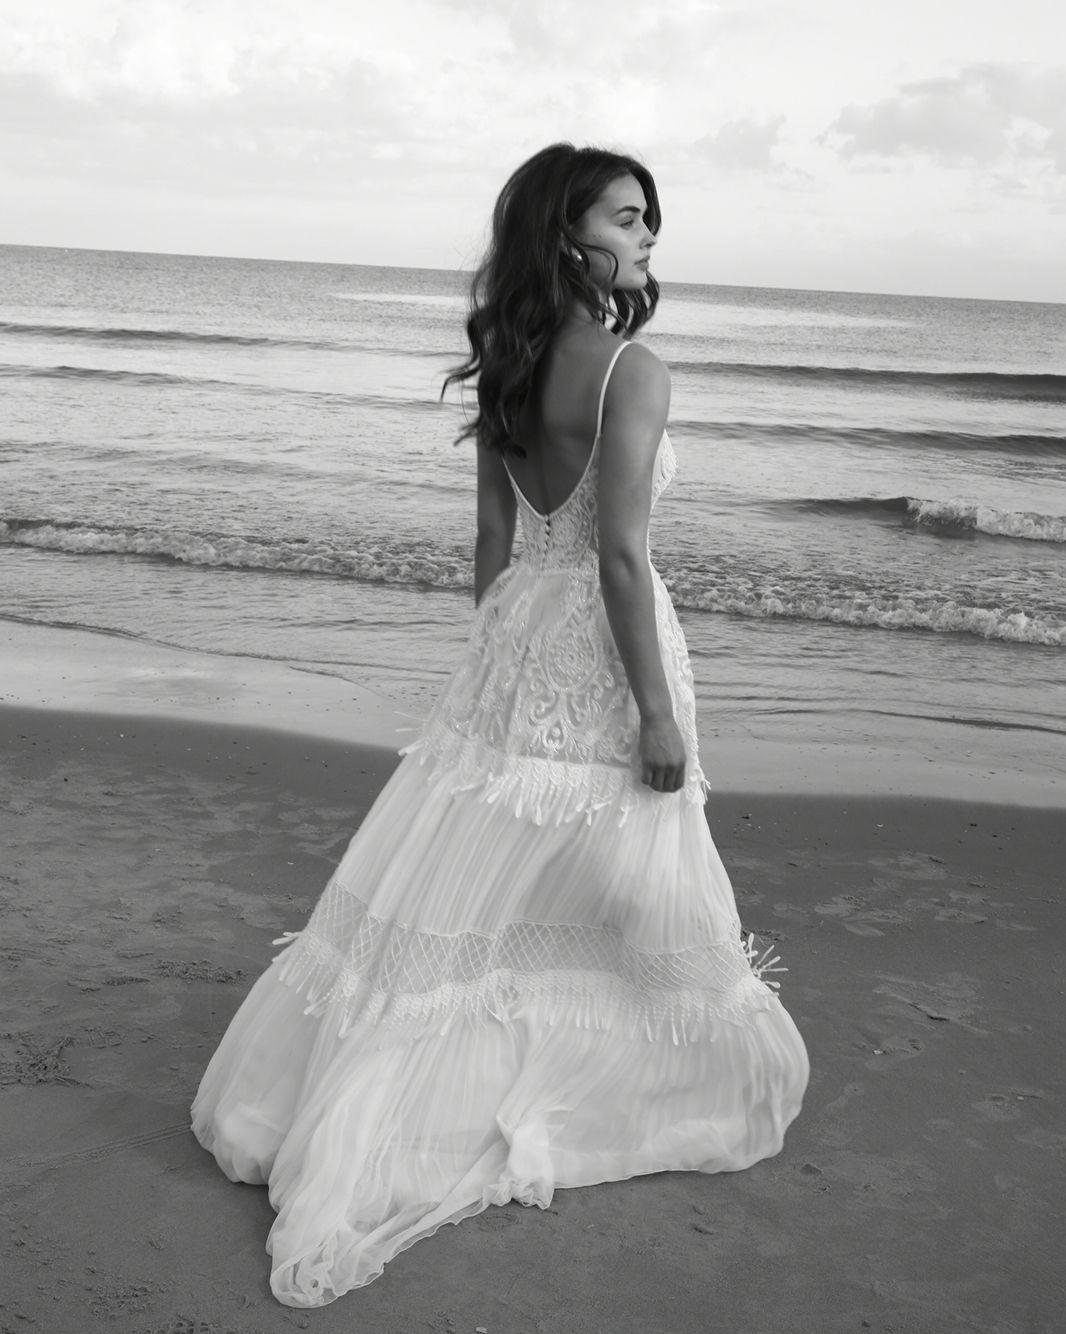 Lightweight wedding dresses  Scoop Neckline Boho Beach Wedding Dress with TasselsAn elegant